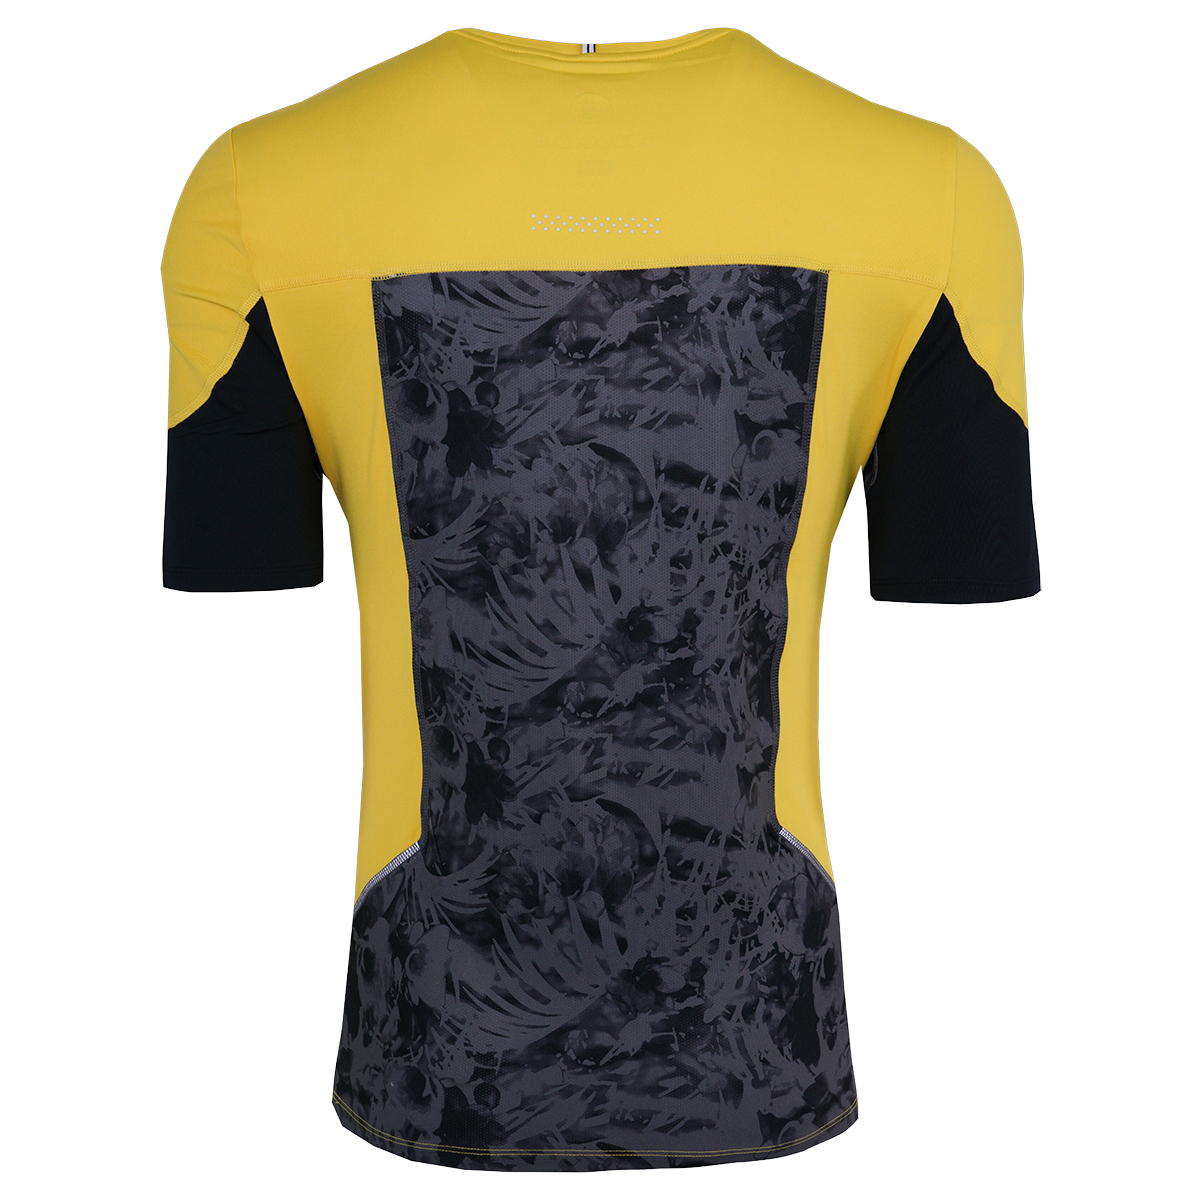 Body-Glove-Men-039-s-Signature-Color-Block-T-Shirt thumbnail 7